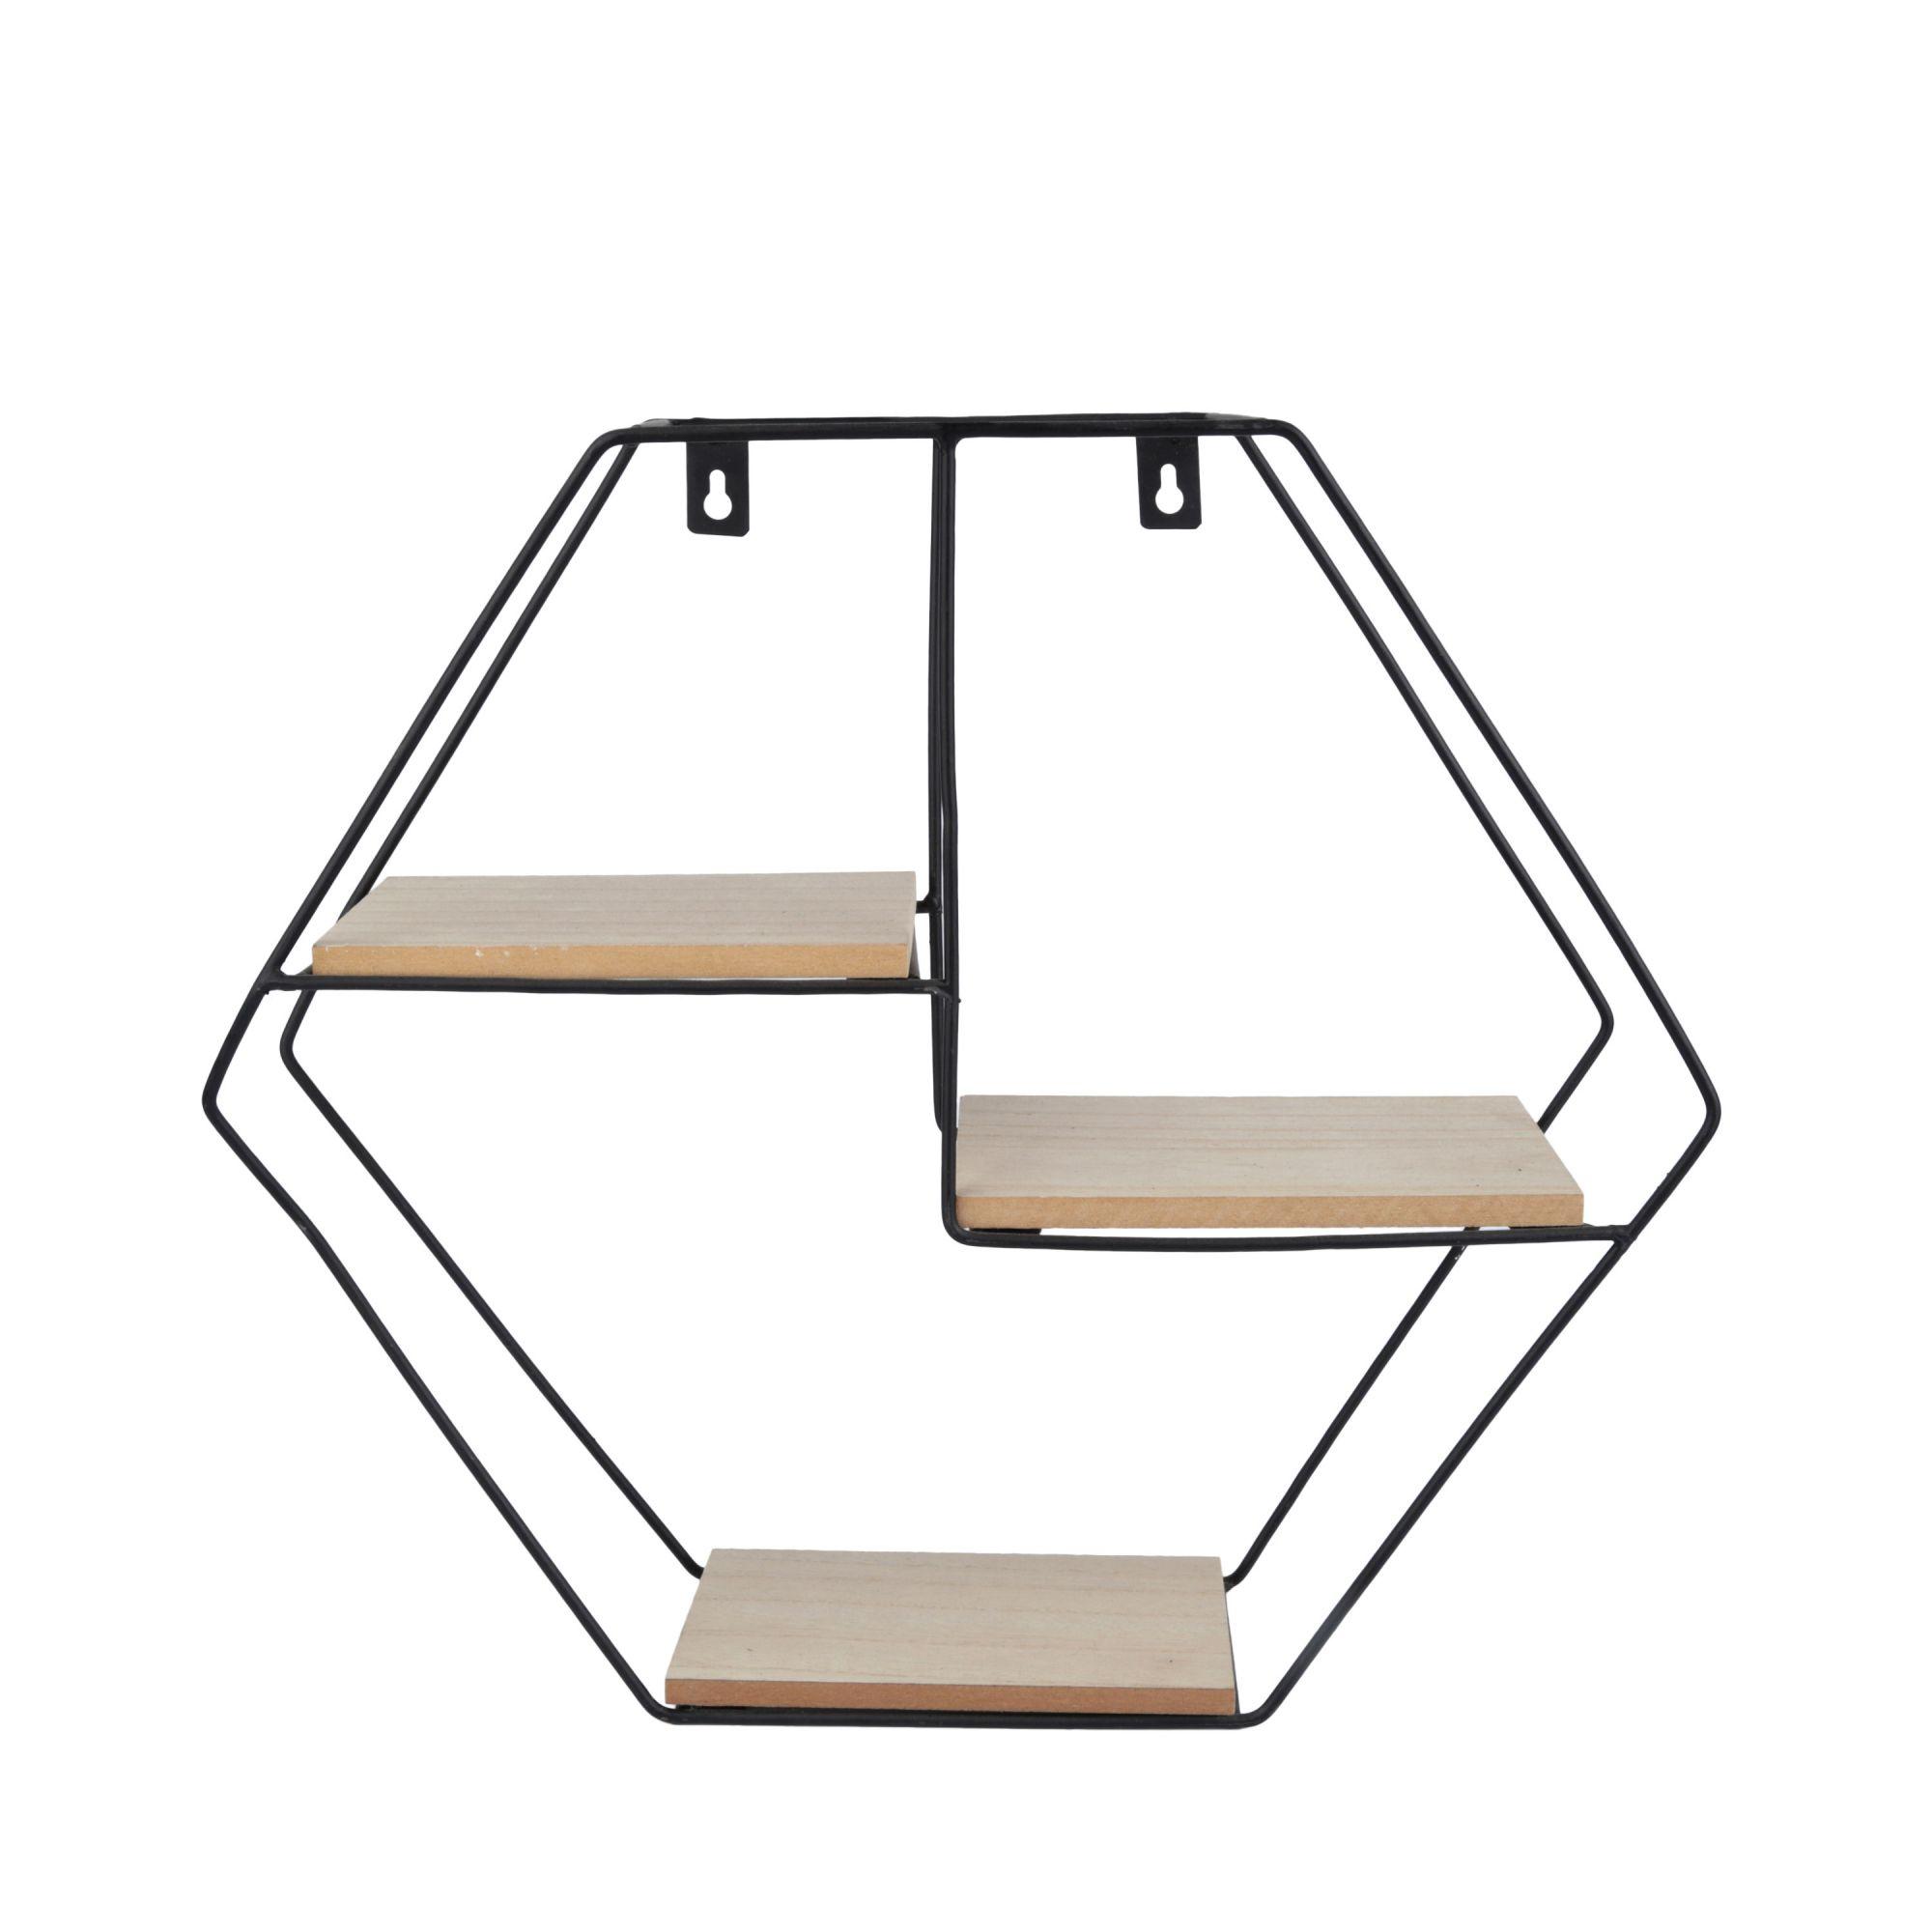 Prateleira Metal/Madeira Formas Geo Hexagonal Preto - Urban